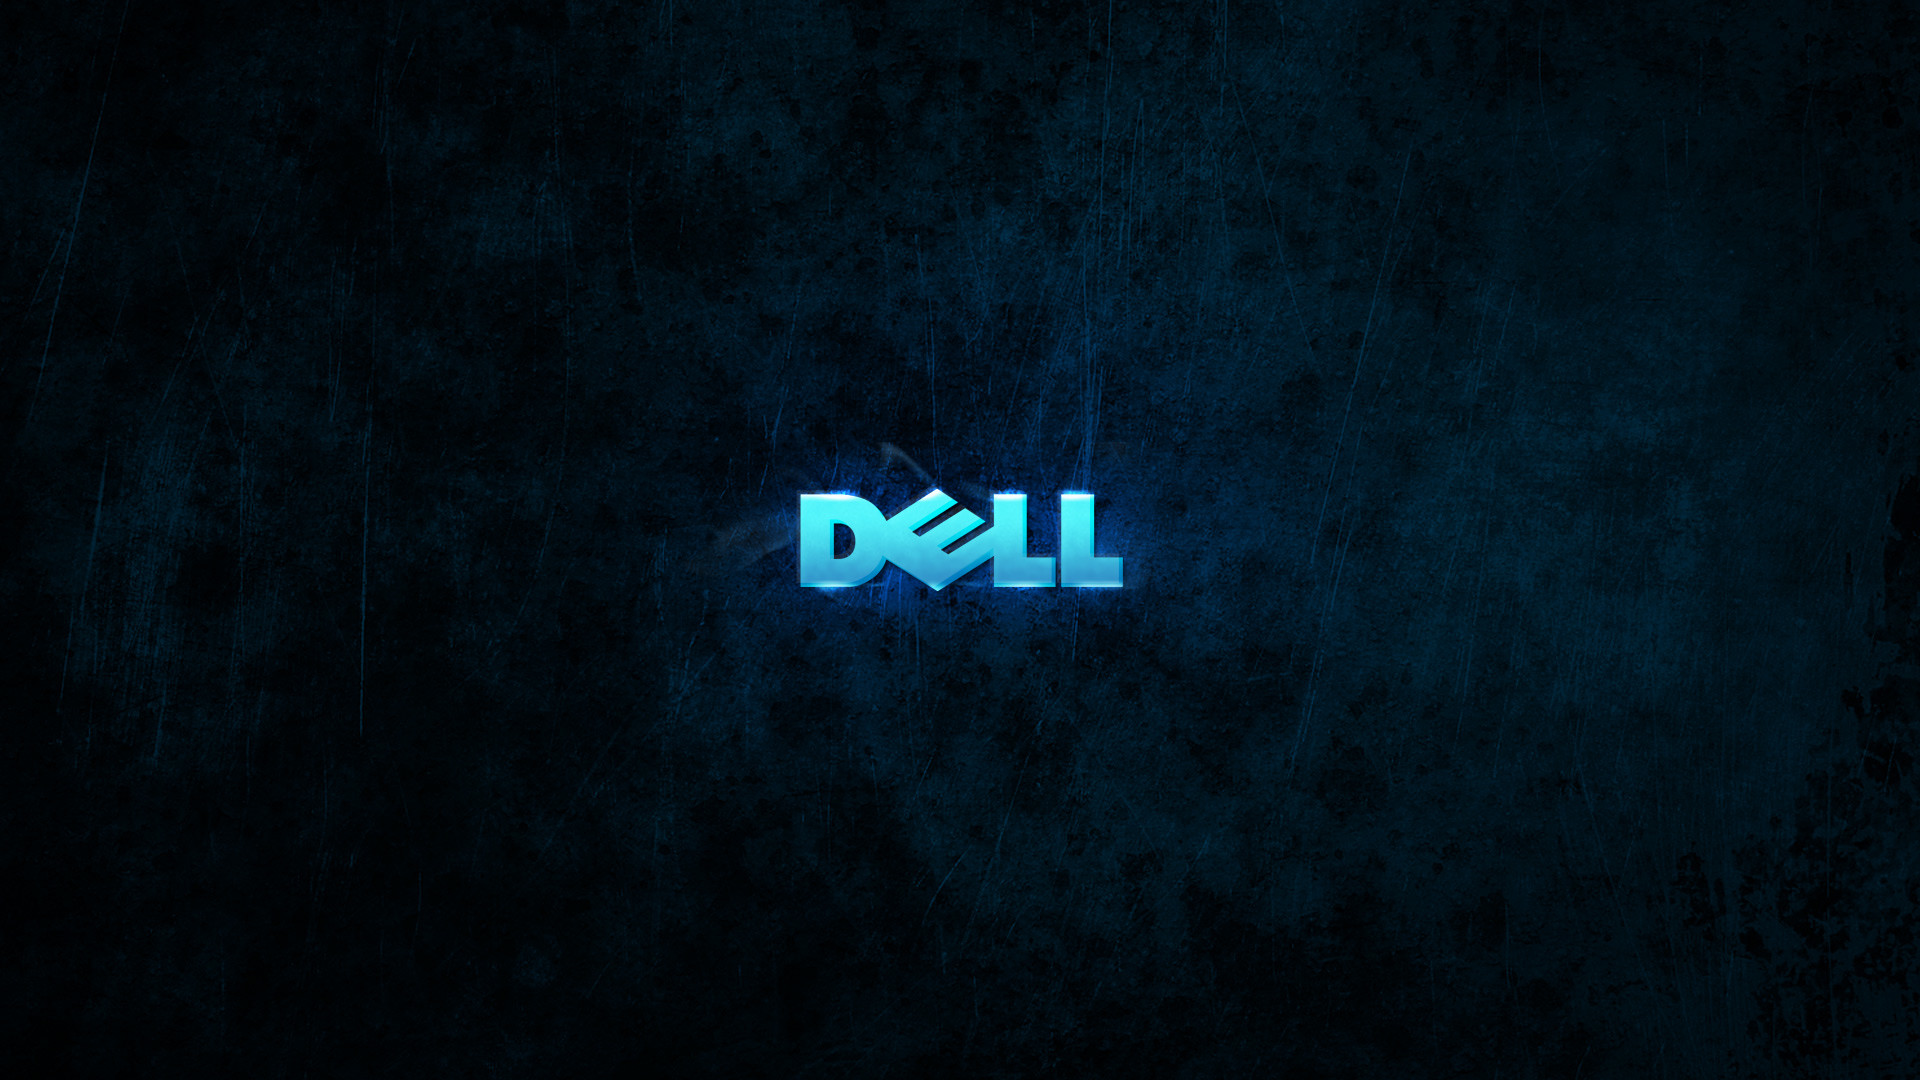 Dell HD Wallpaper ~ HD Wallpaper 1 HTML code. sent by ahmed el  saied at 8:07 AM